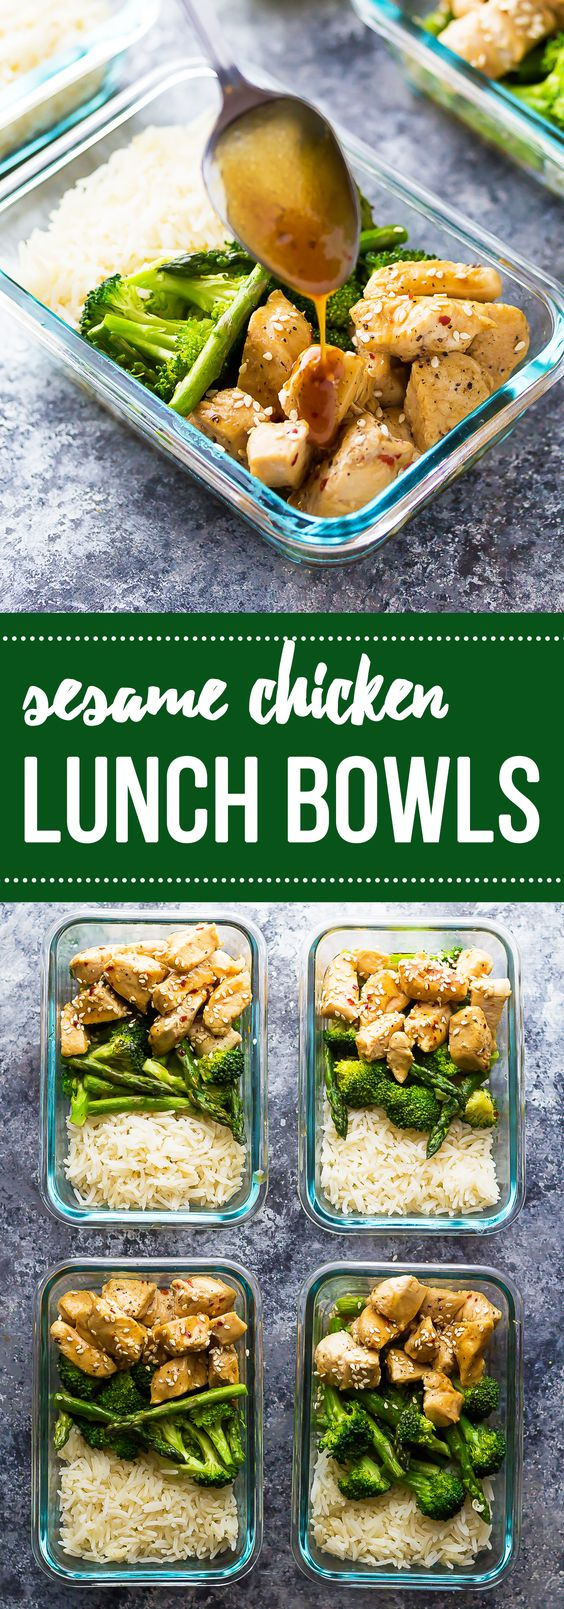 Honey Sesame Chicken Lunch Bowls